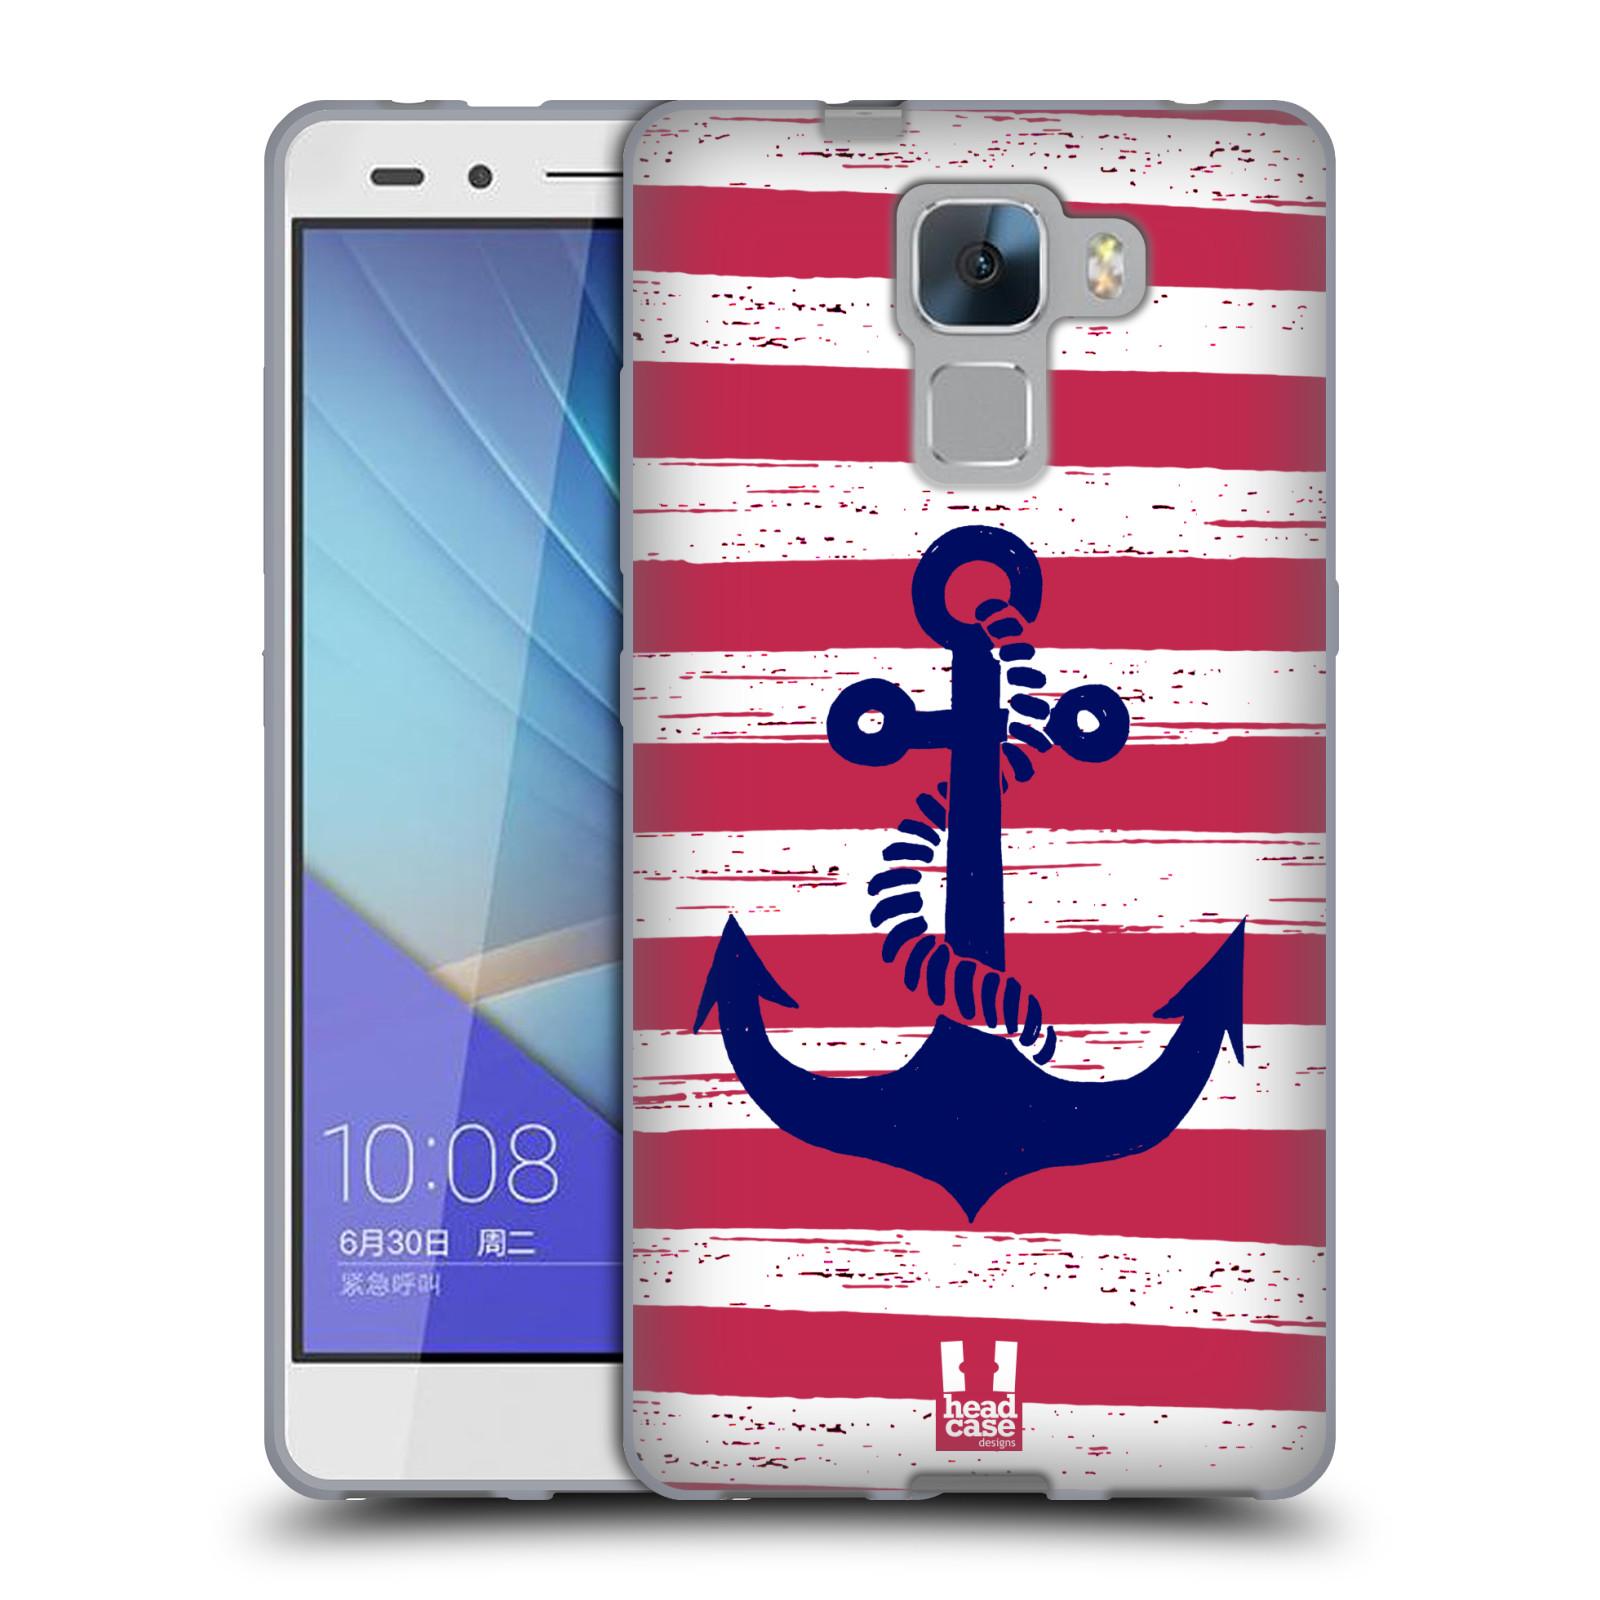 Silikonové pouzdro na mobil Honor 7 HEAD CASE KOTVA S PRUHY